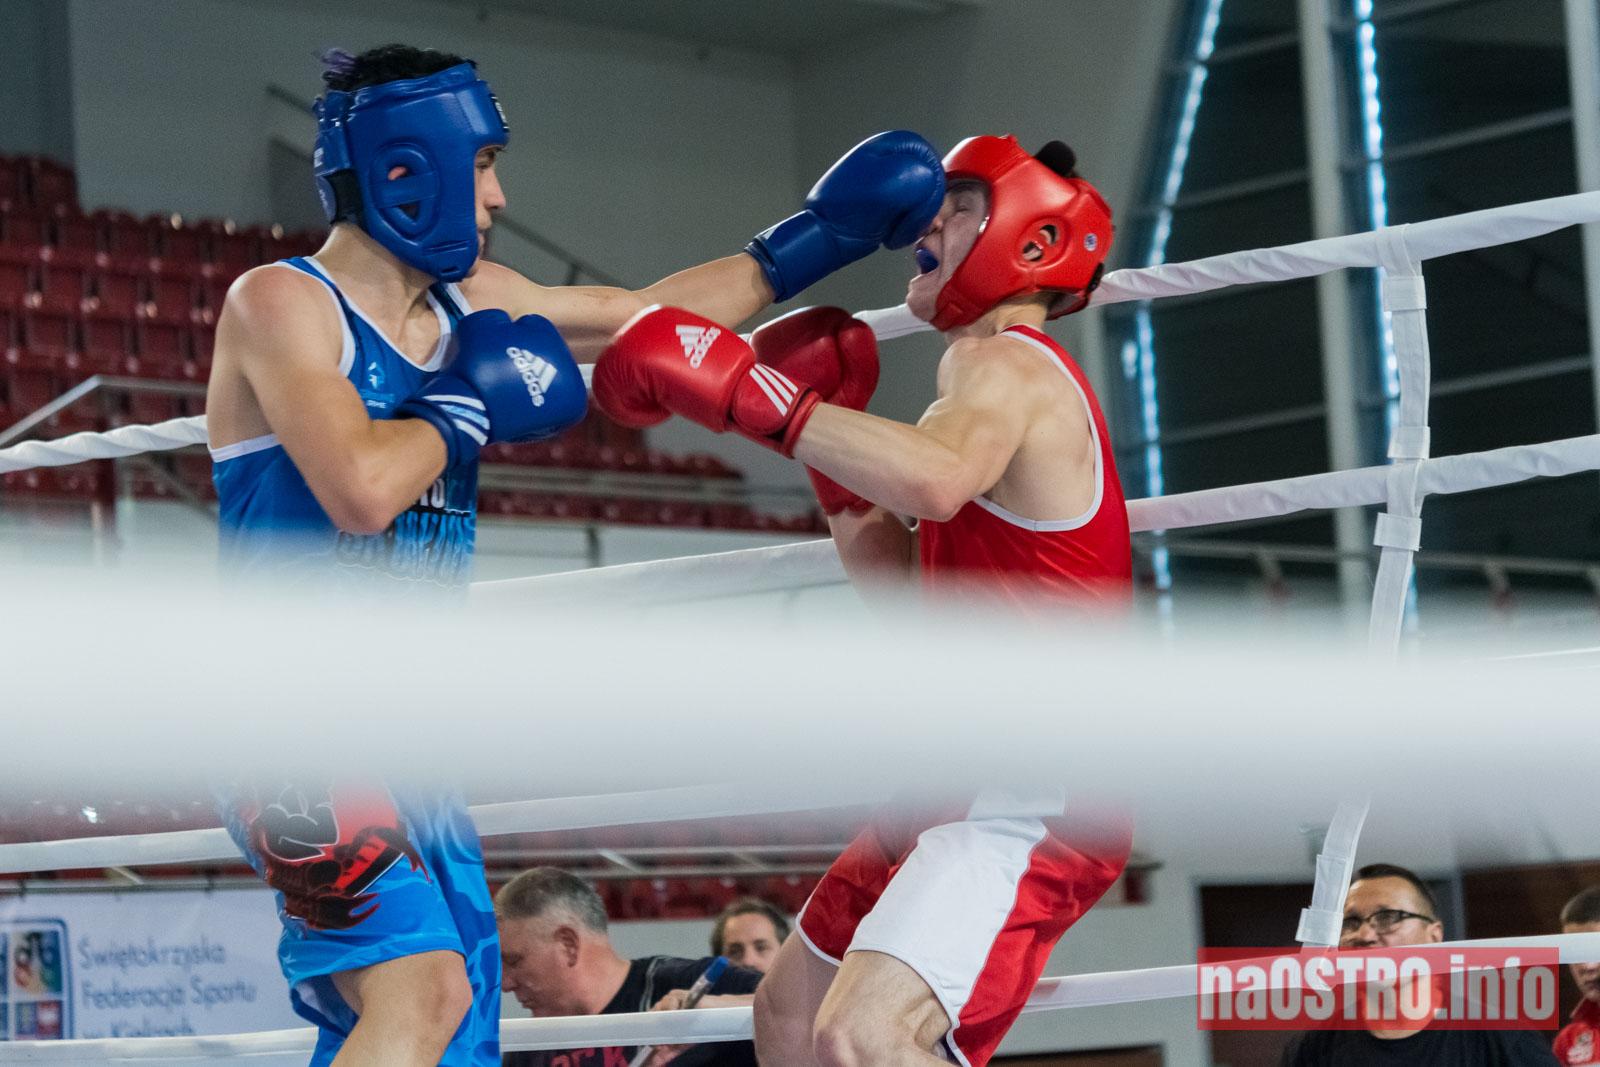 NaOSTRO BOKS Olimpiada-54